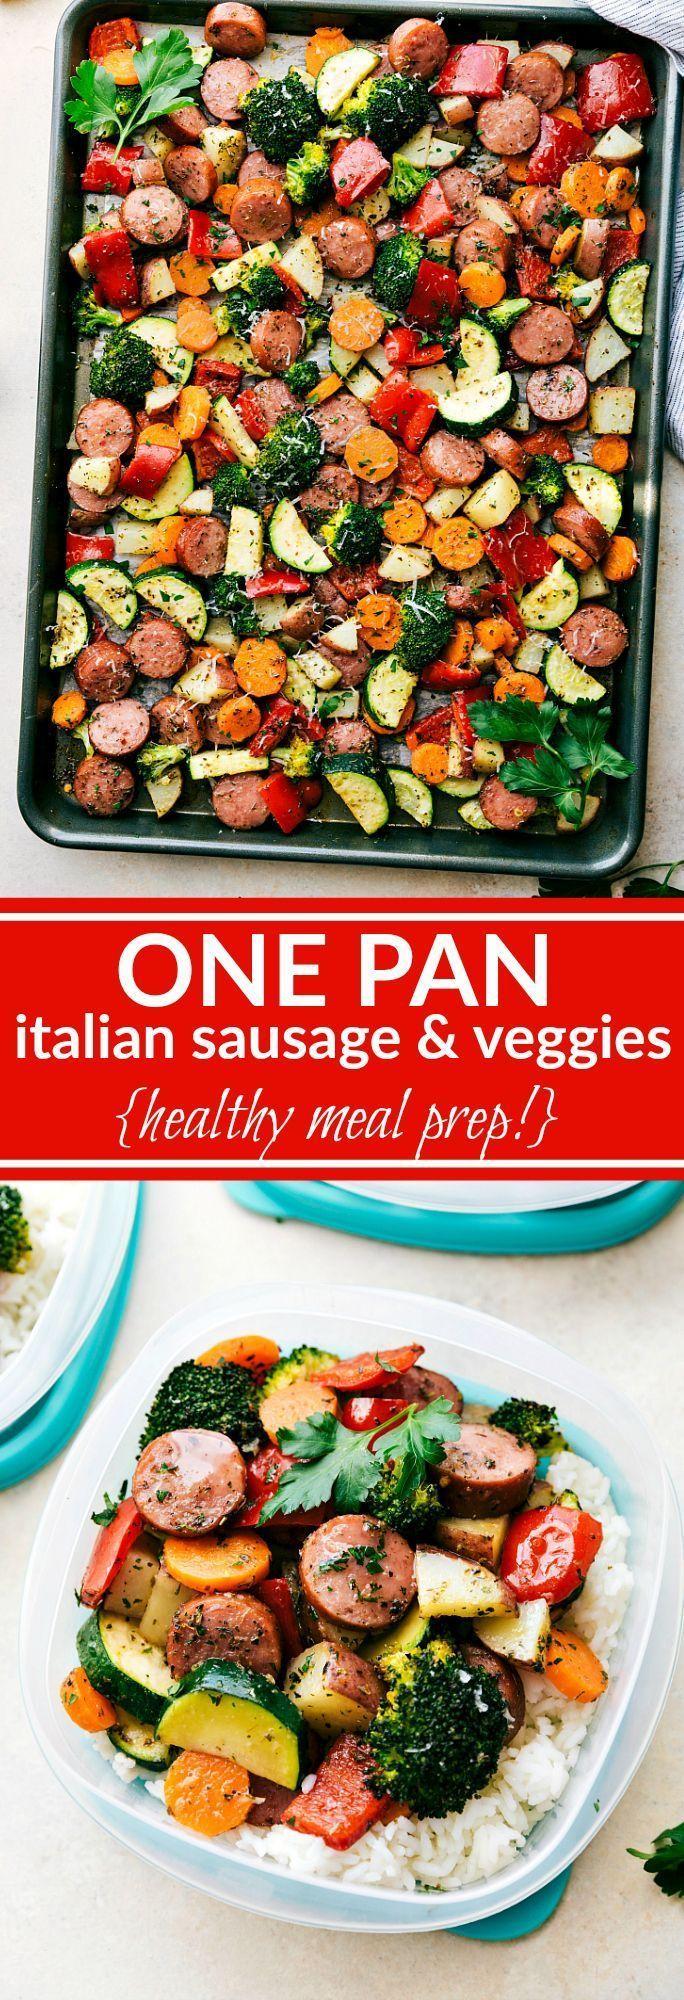 One Pan Healthy Italian Sausage & Veggies | Chelsea's Messy Apron